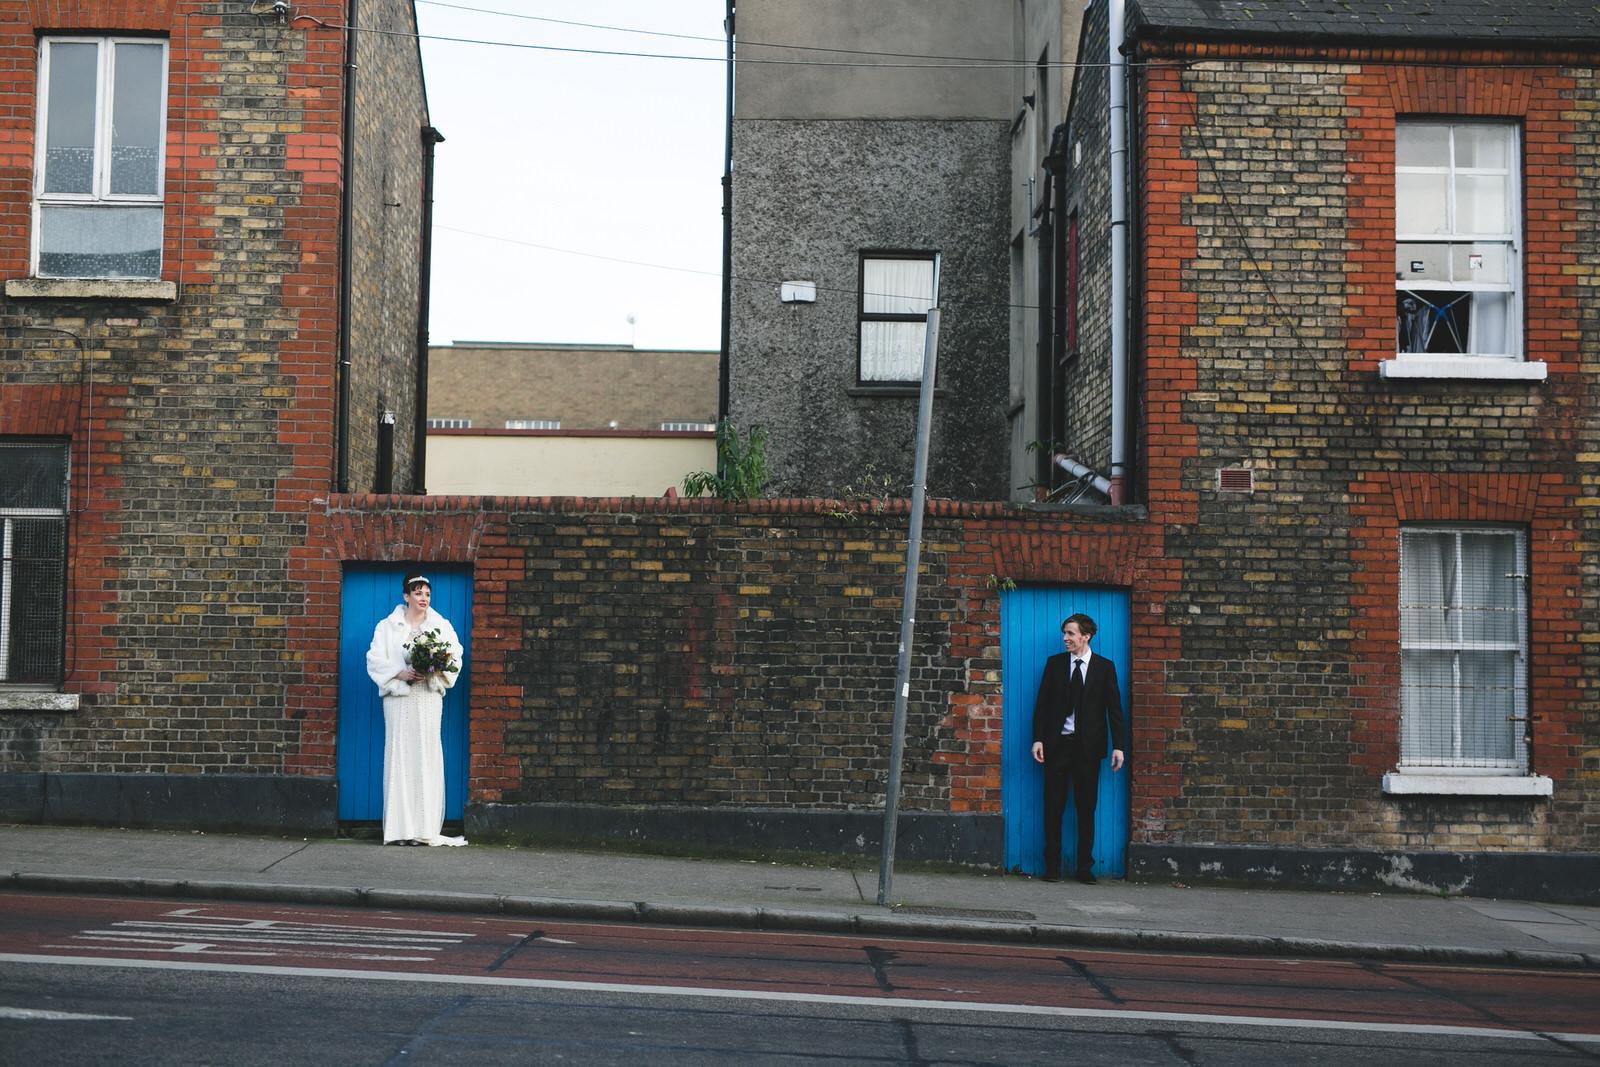 wedding photos around Smithfield area after ceremony in Blackhall Law Society